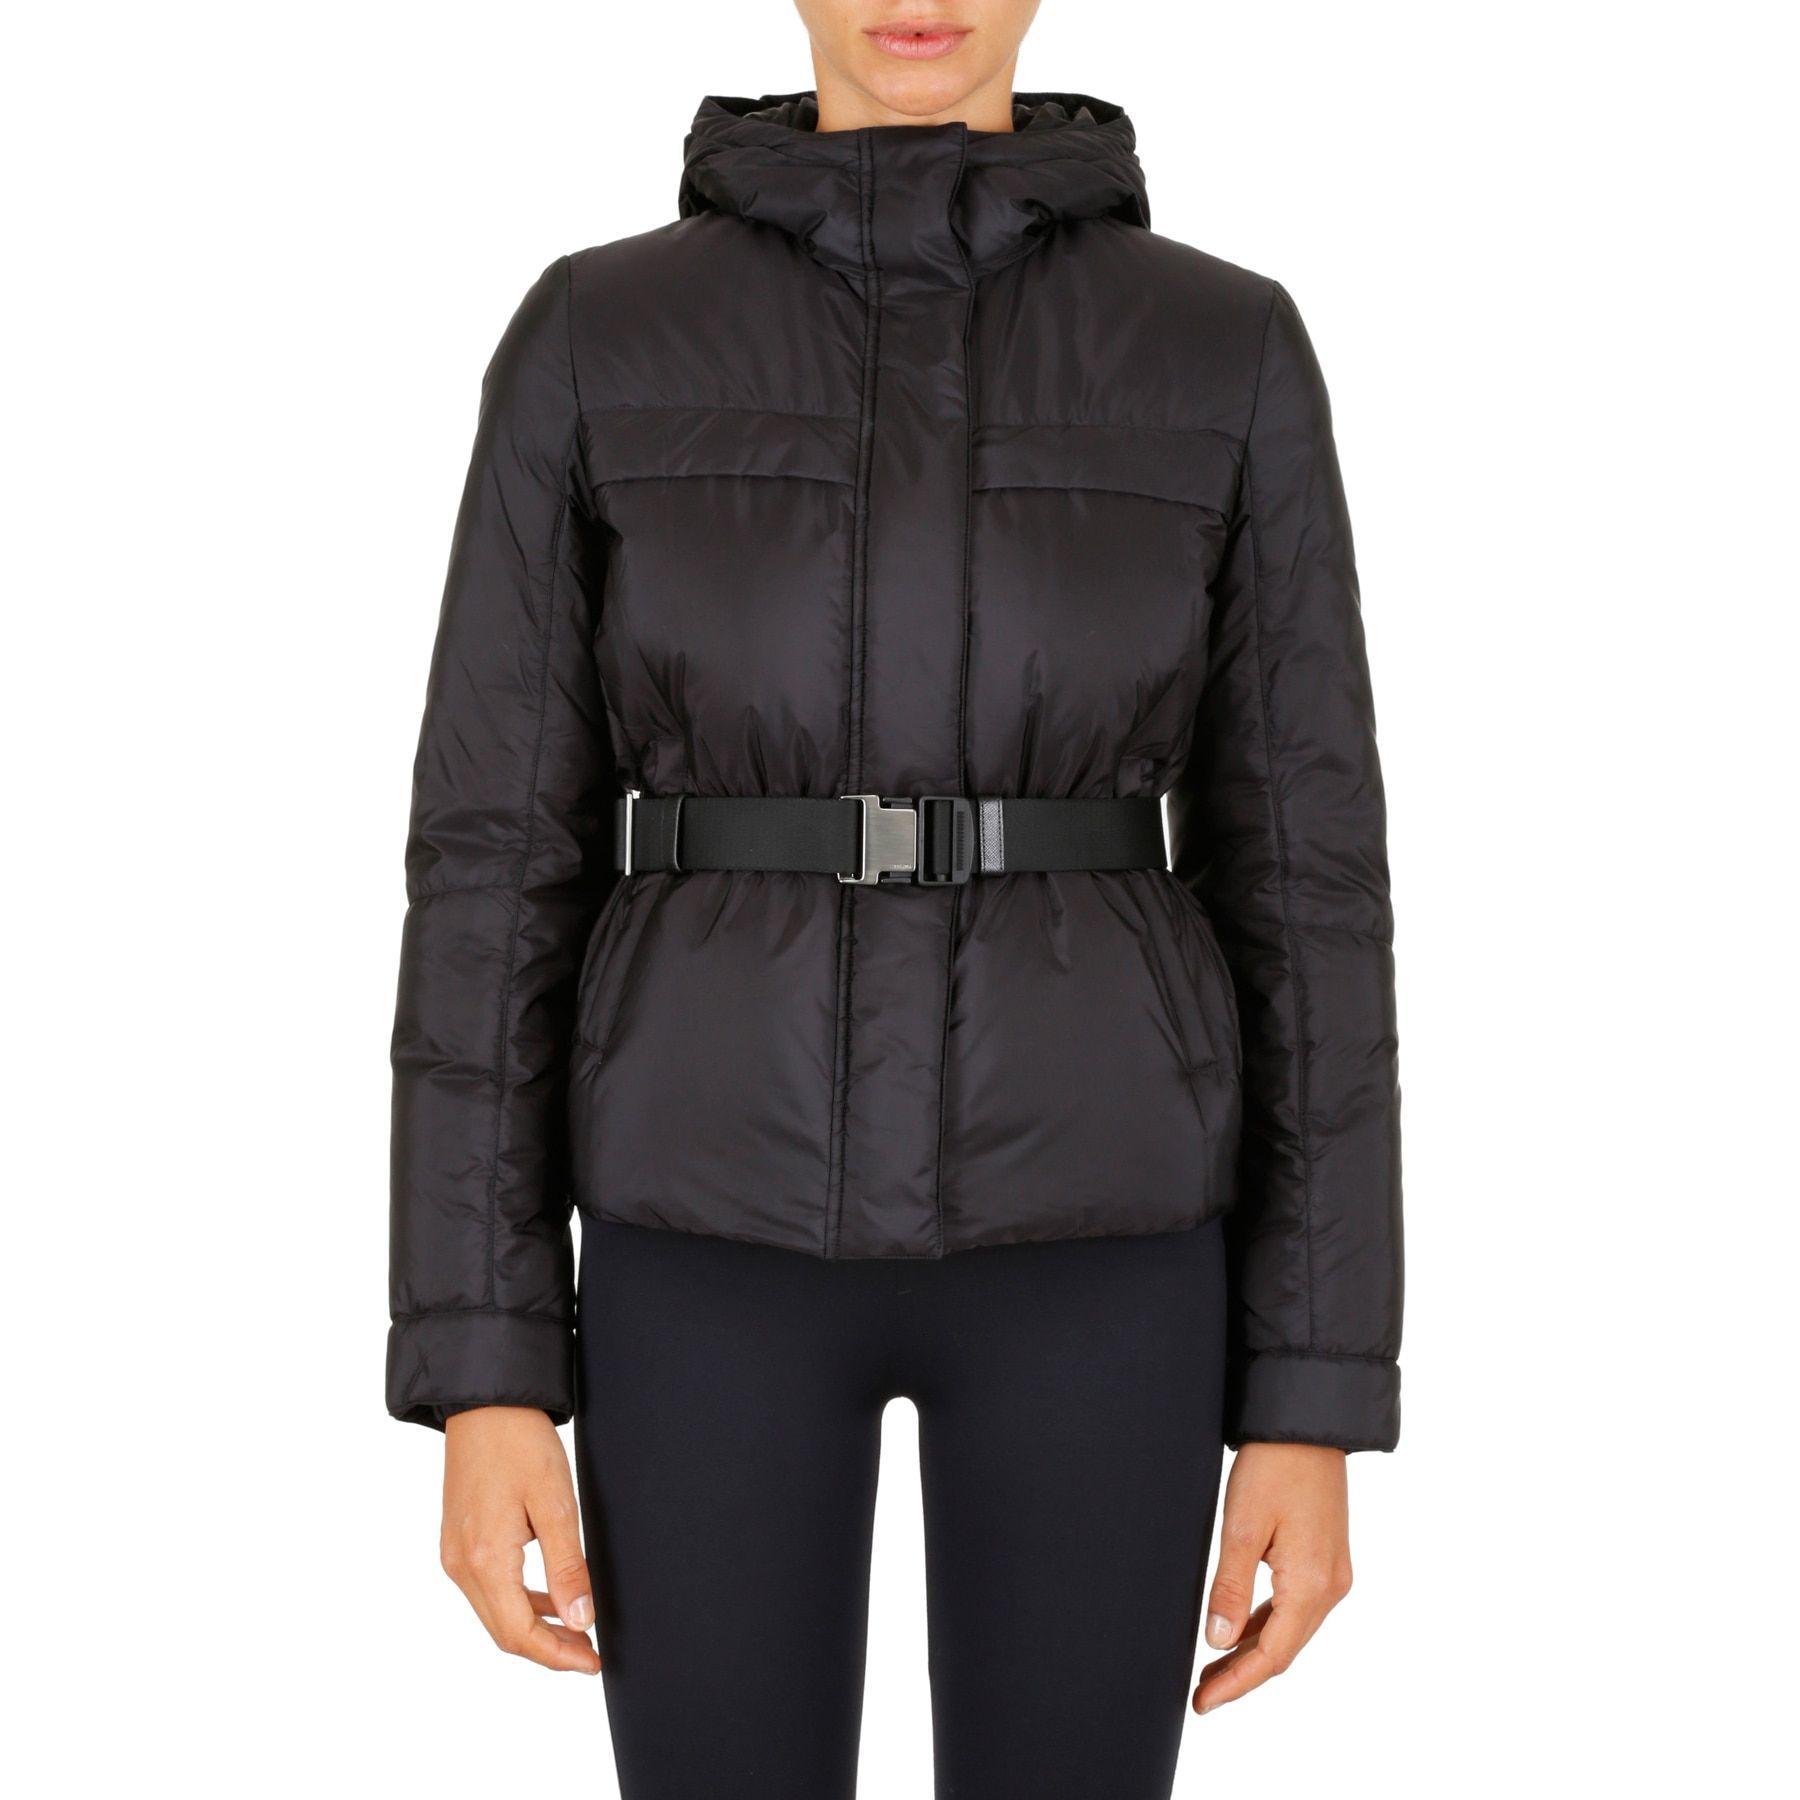 Our Best Women S Designer Clothing Deals Jackets Womens Black Belt Designer Outfits Woman [ 1800 x 1800 Pixel ]